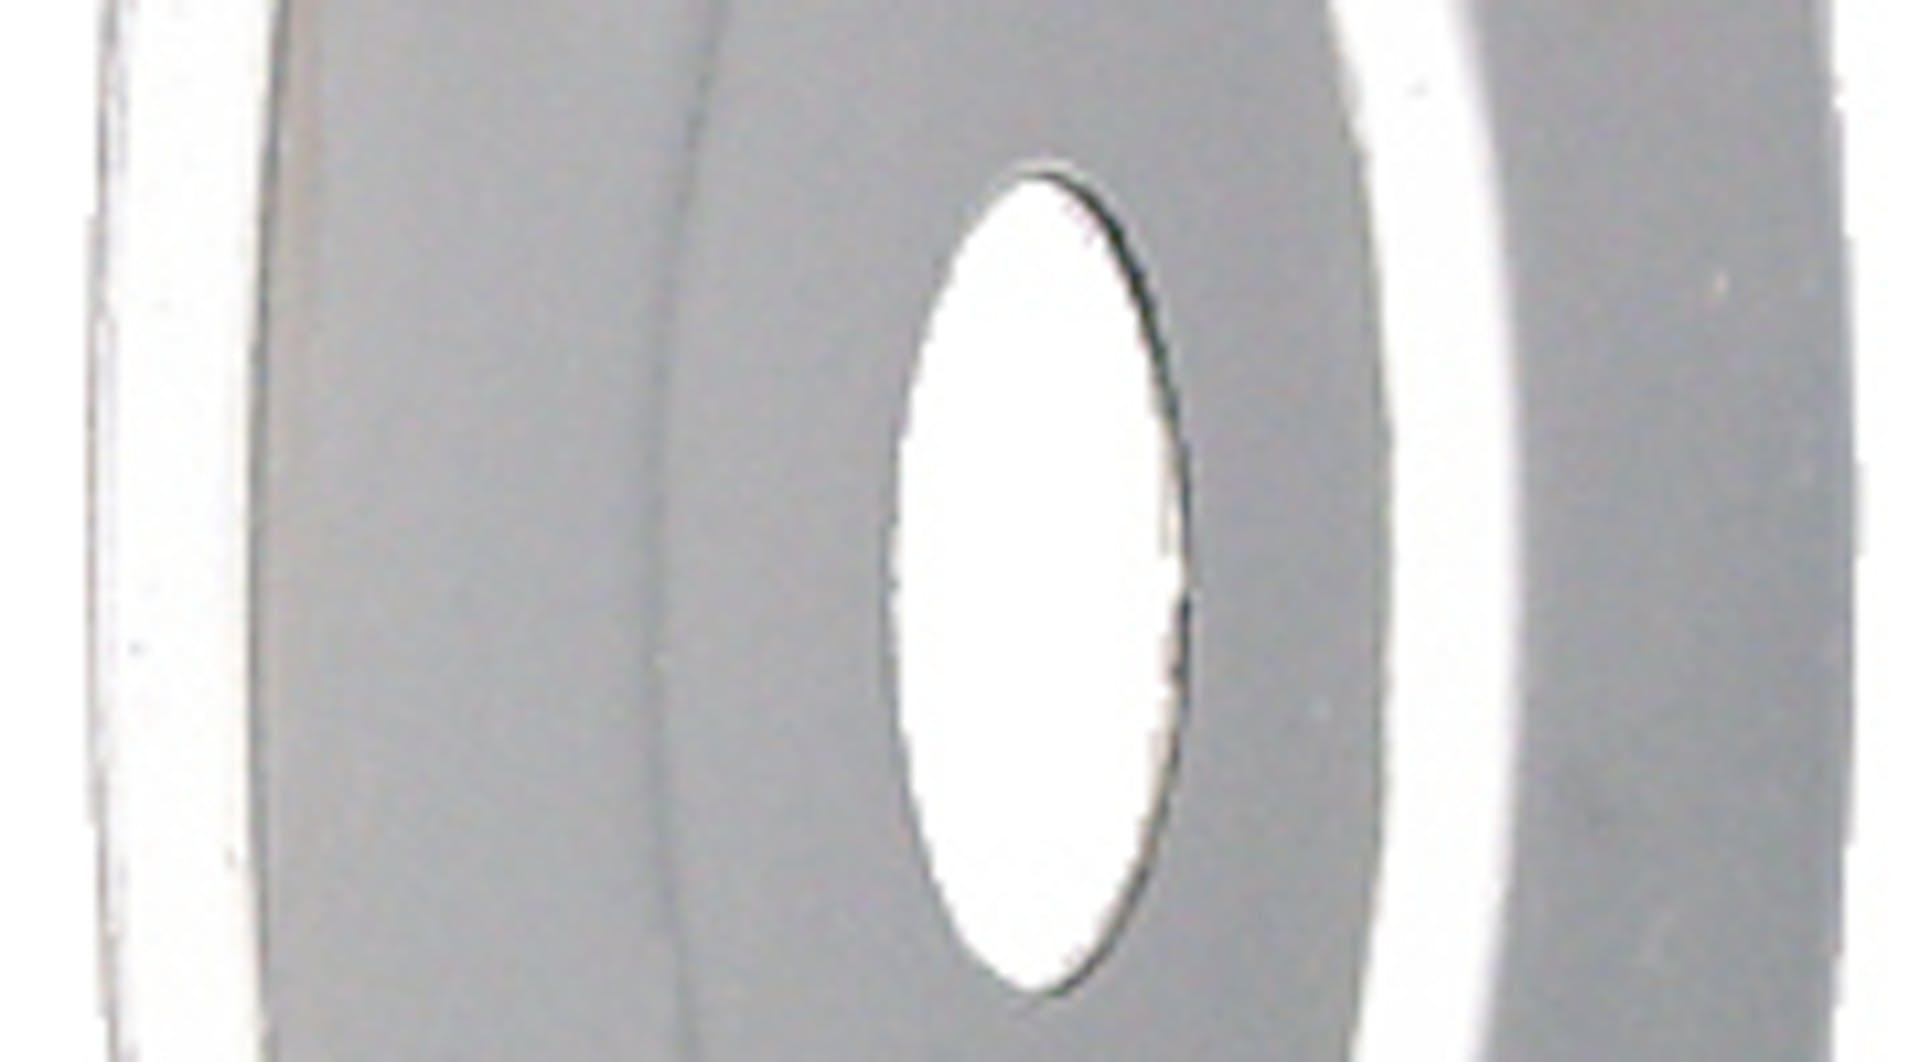 Ceilingrock, product image